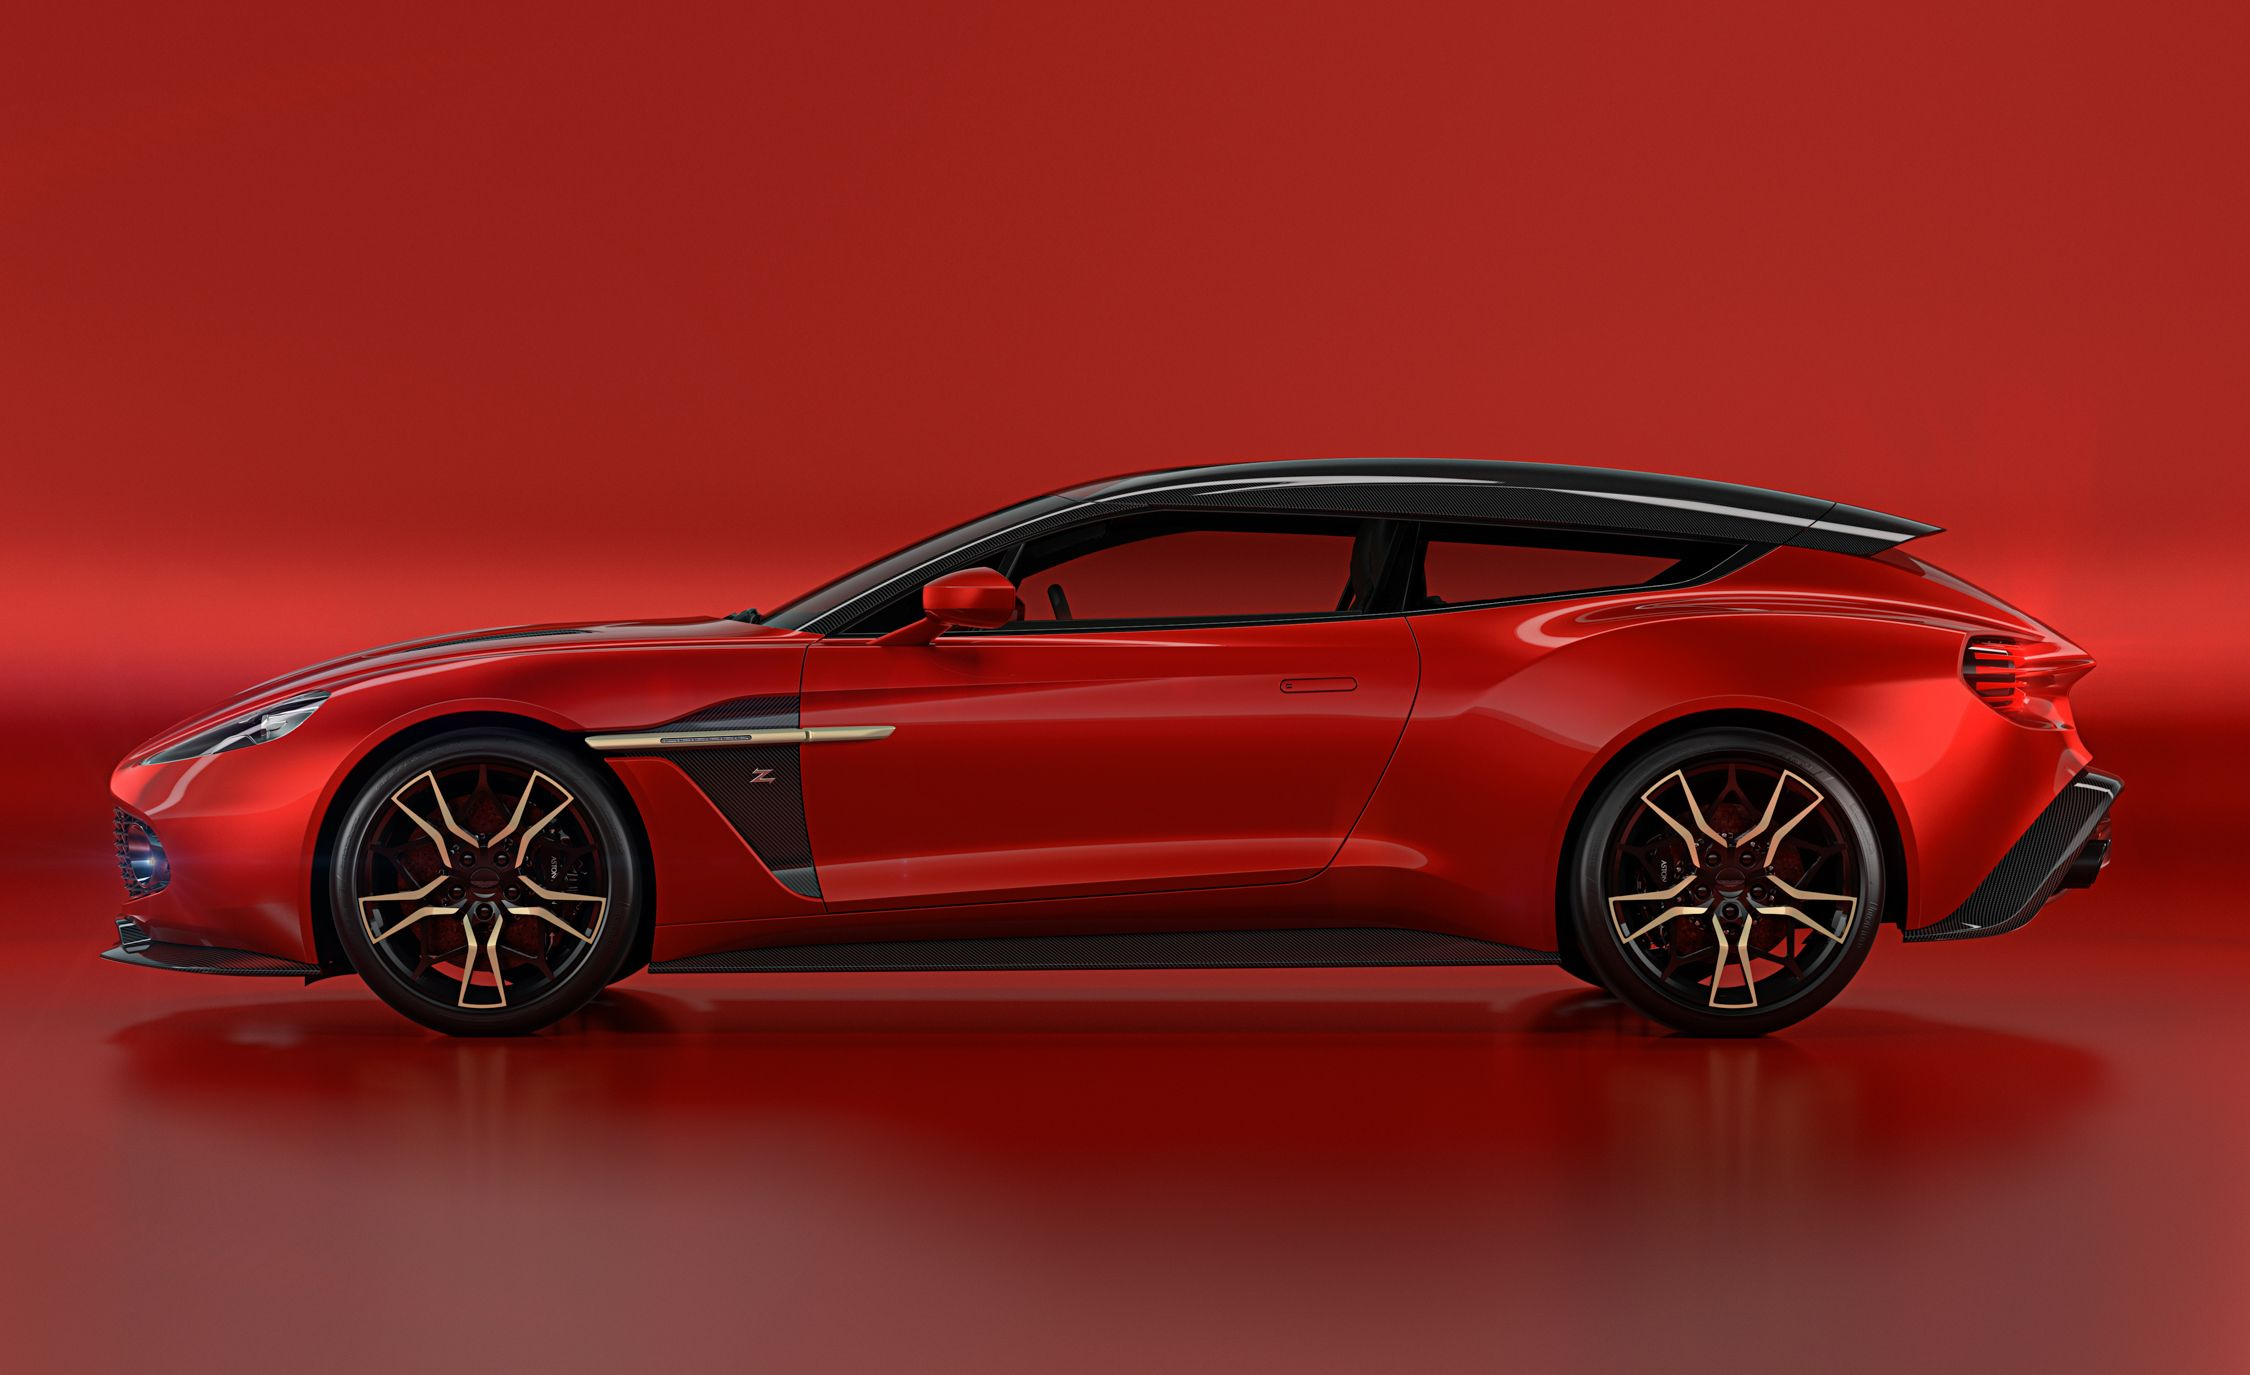 2018 Aston Martin Vanquish Zagato Shooting Brake Pictures   Photo Gallery